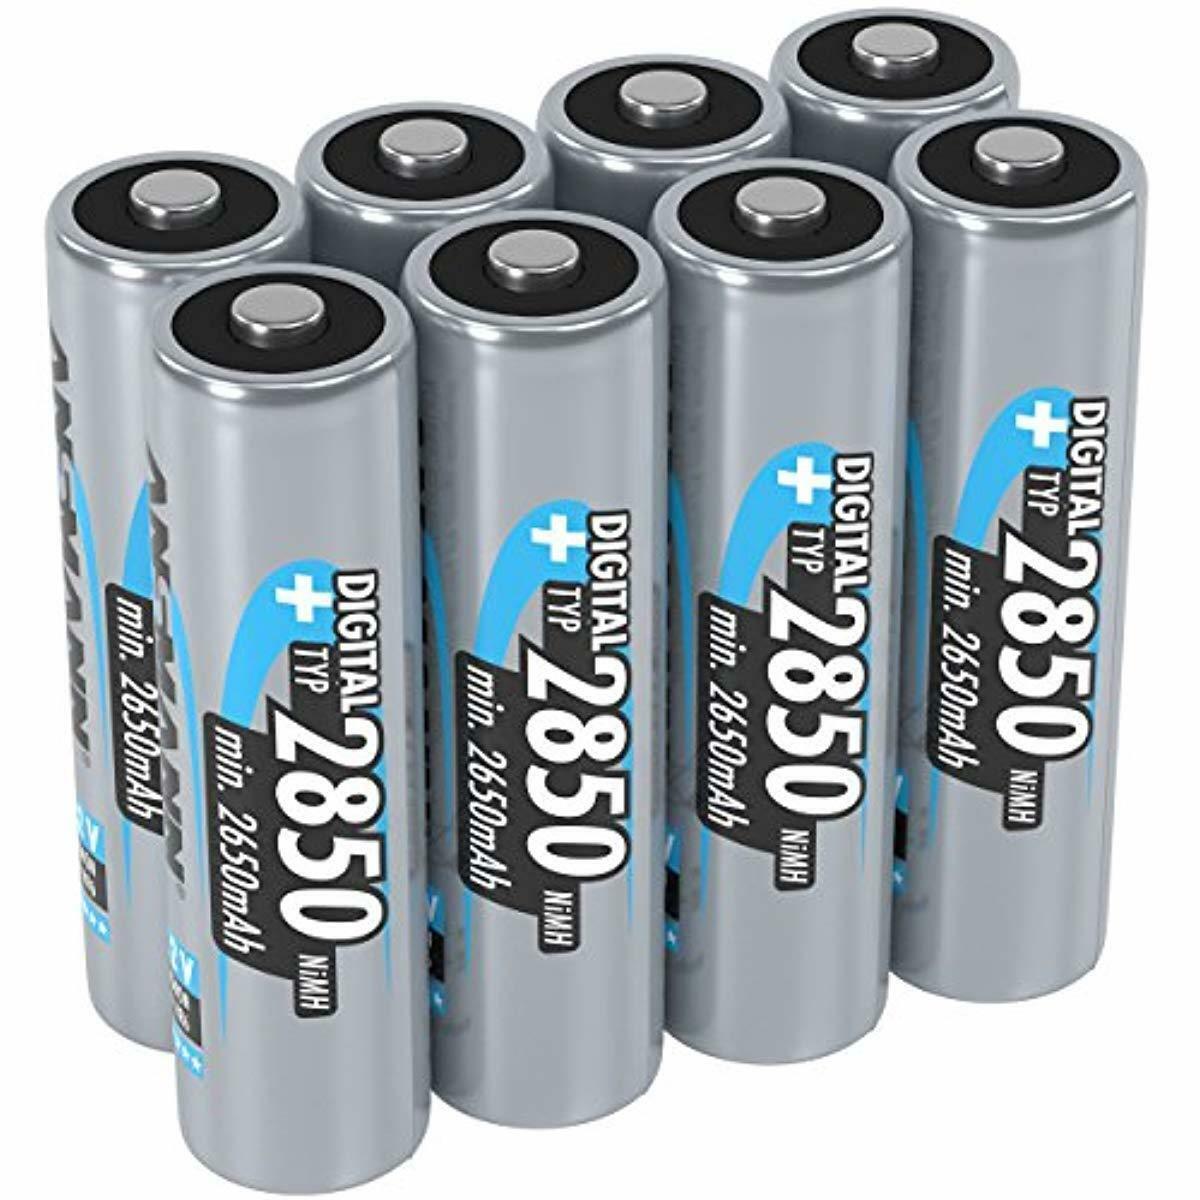 8x Akkus AA Mignon Typ 2850mAh 1,2V - Wiederaufladbare Batterien OHNE MEMORY